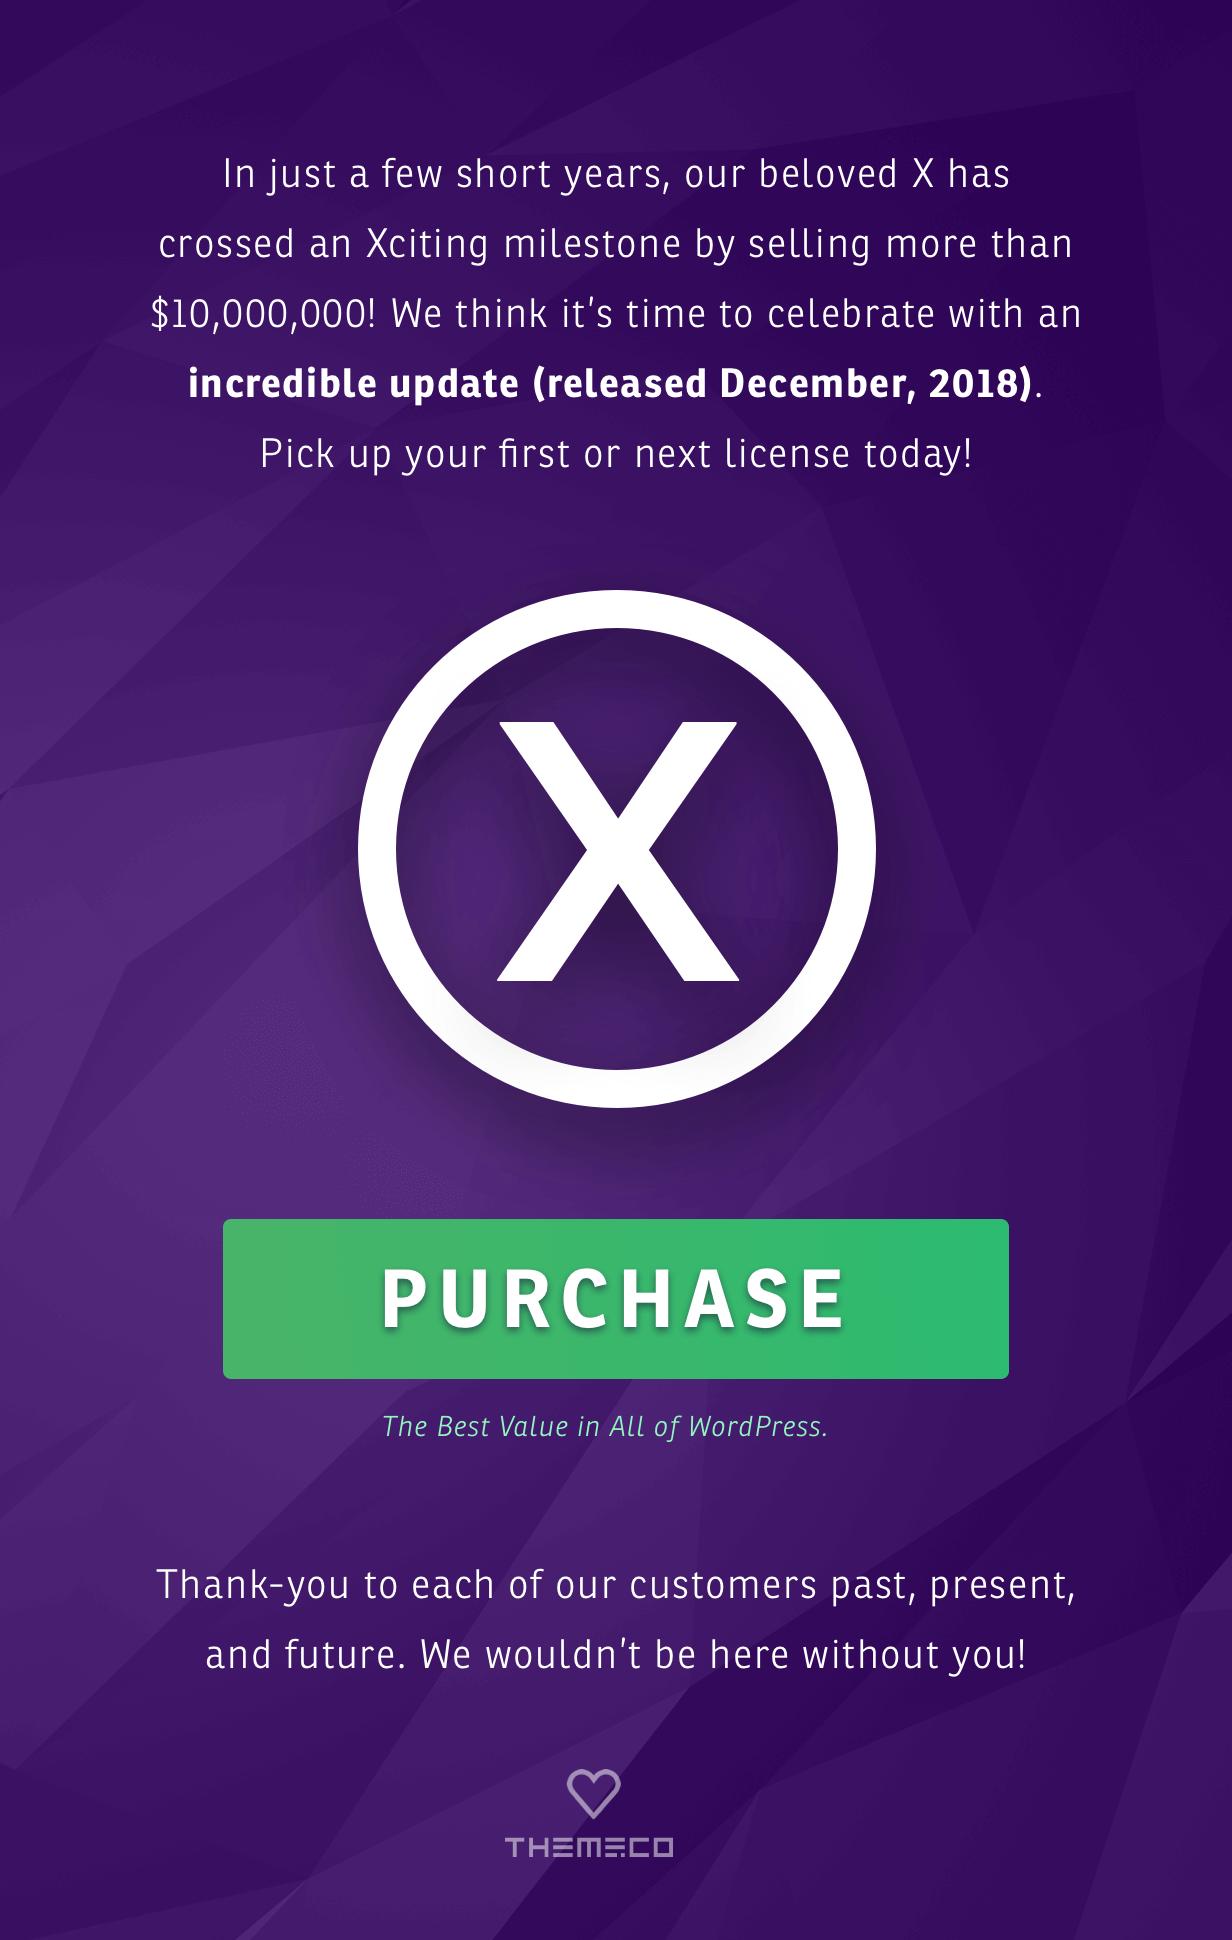 X | The Theme - 1